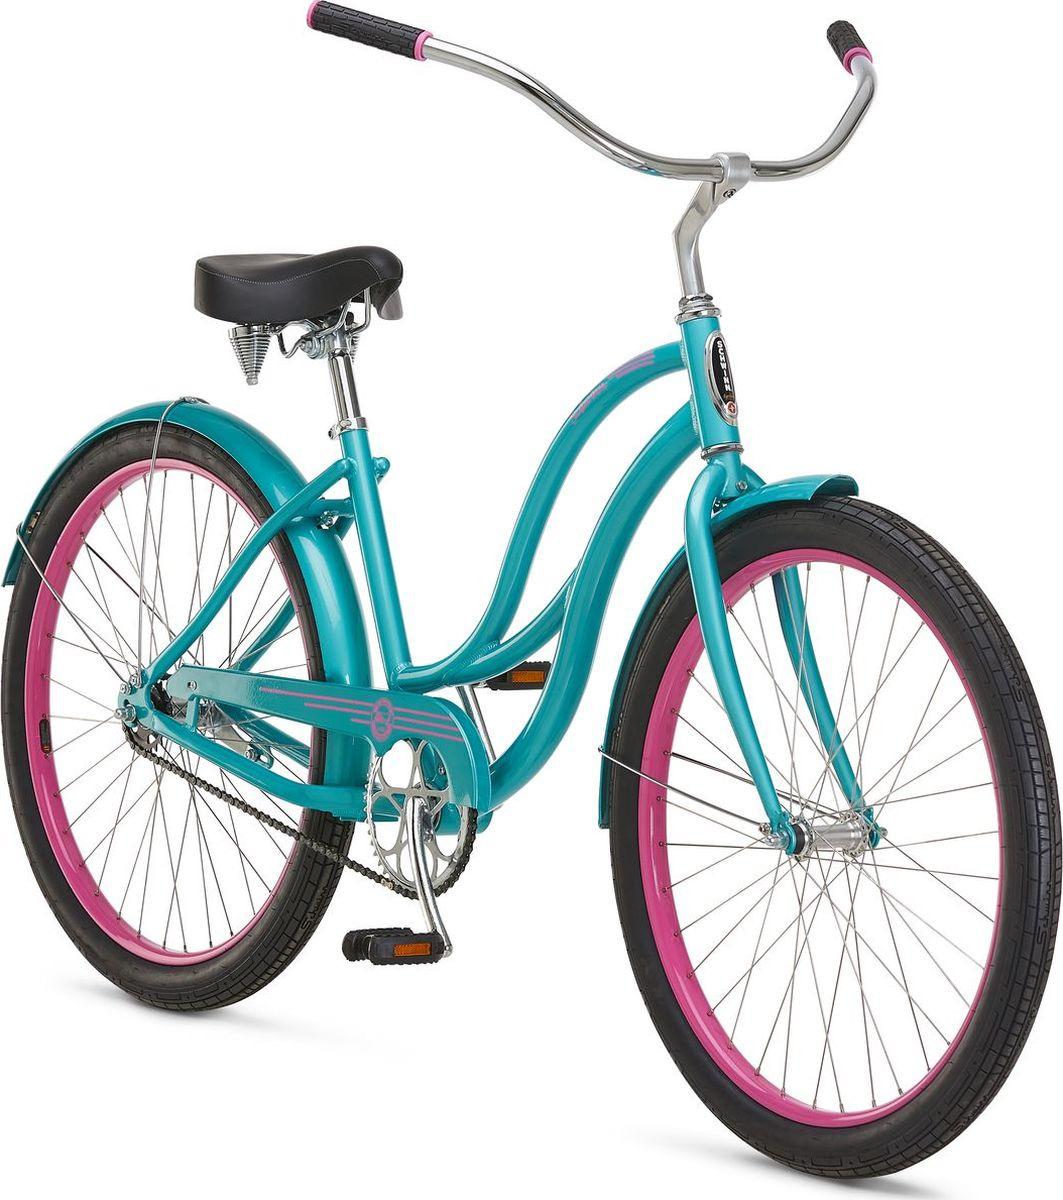 Велосипед городской Schwinn ALU 1 Women, колесо 26, голубой велосипед schwinn twister 2017